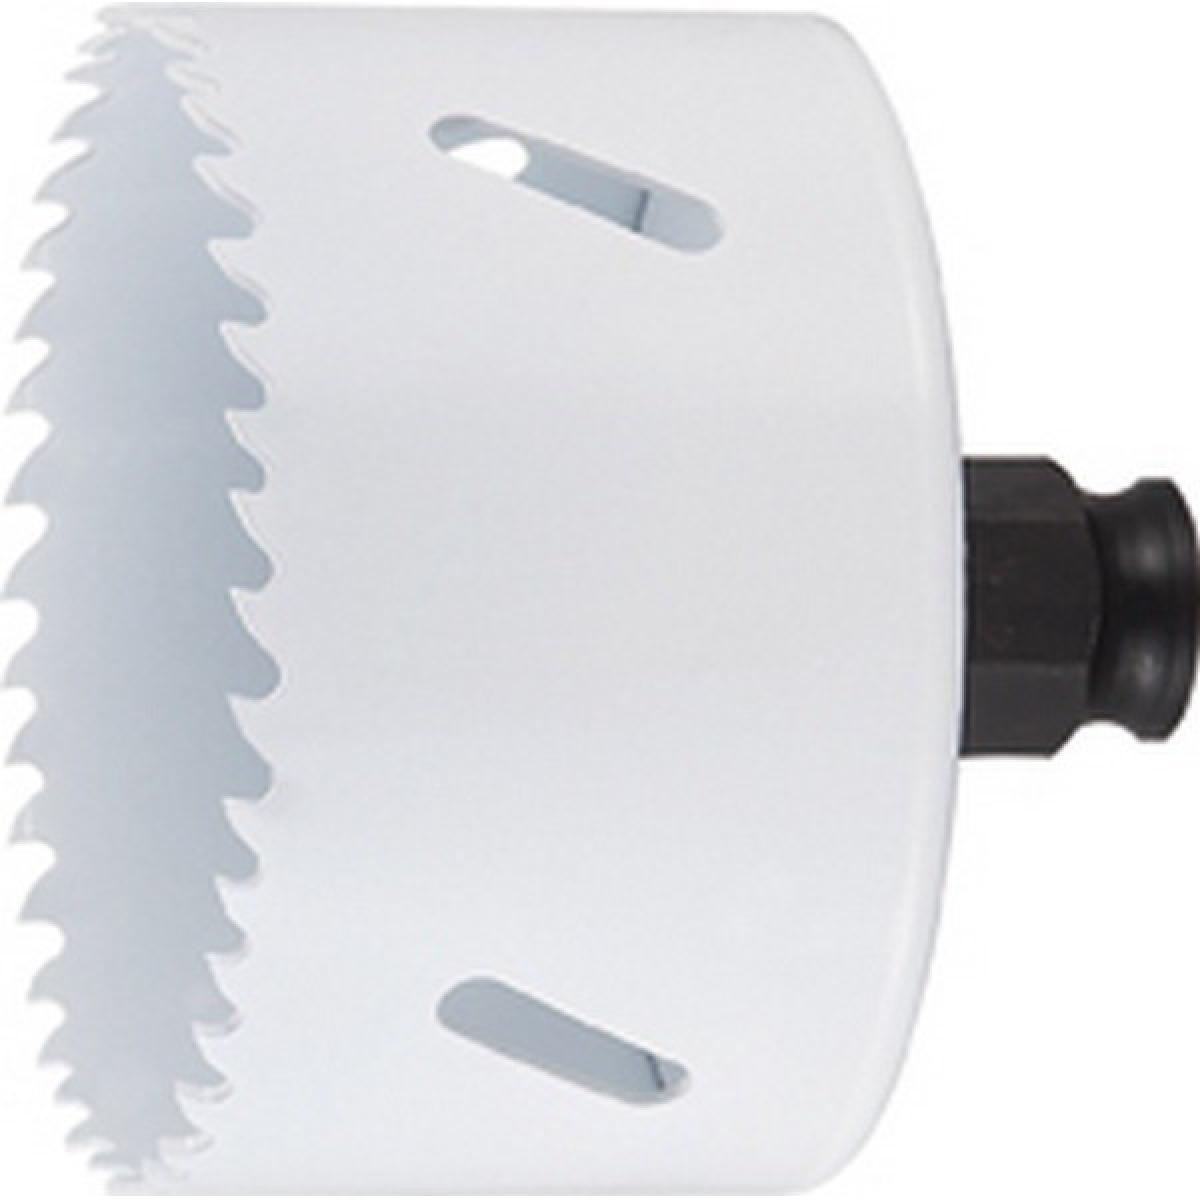 Bosch Scie trépan Power Change, Ø : 140 mm, Vitesse de rotation tr/mn INOX 25, Vitesse de rotation tr/mn acier 60